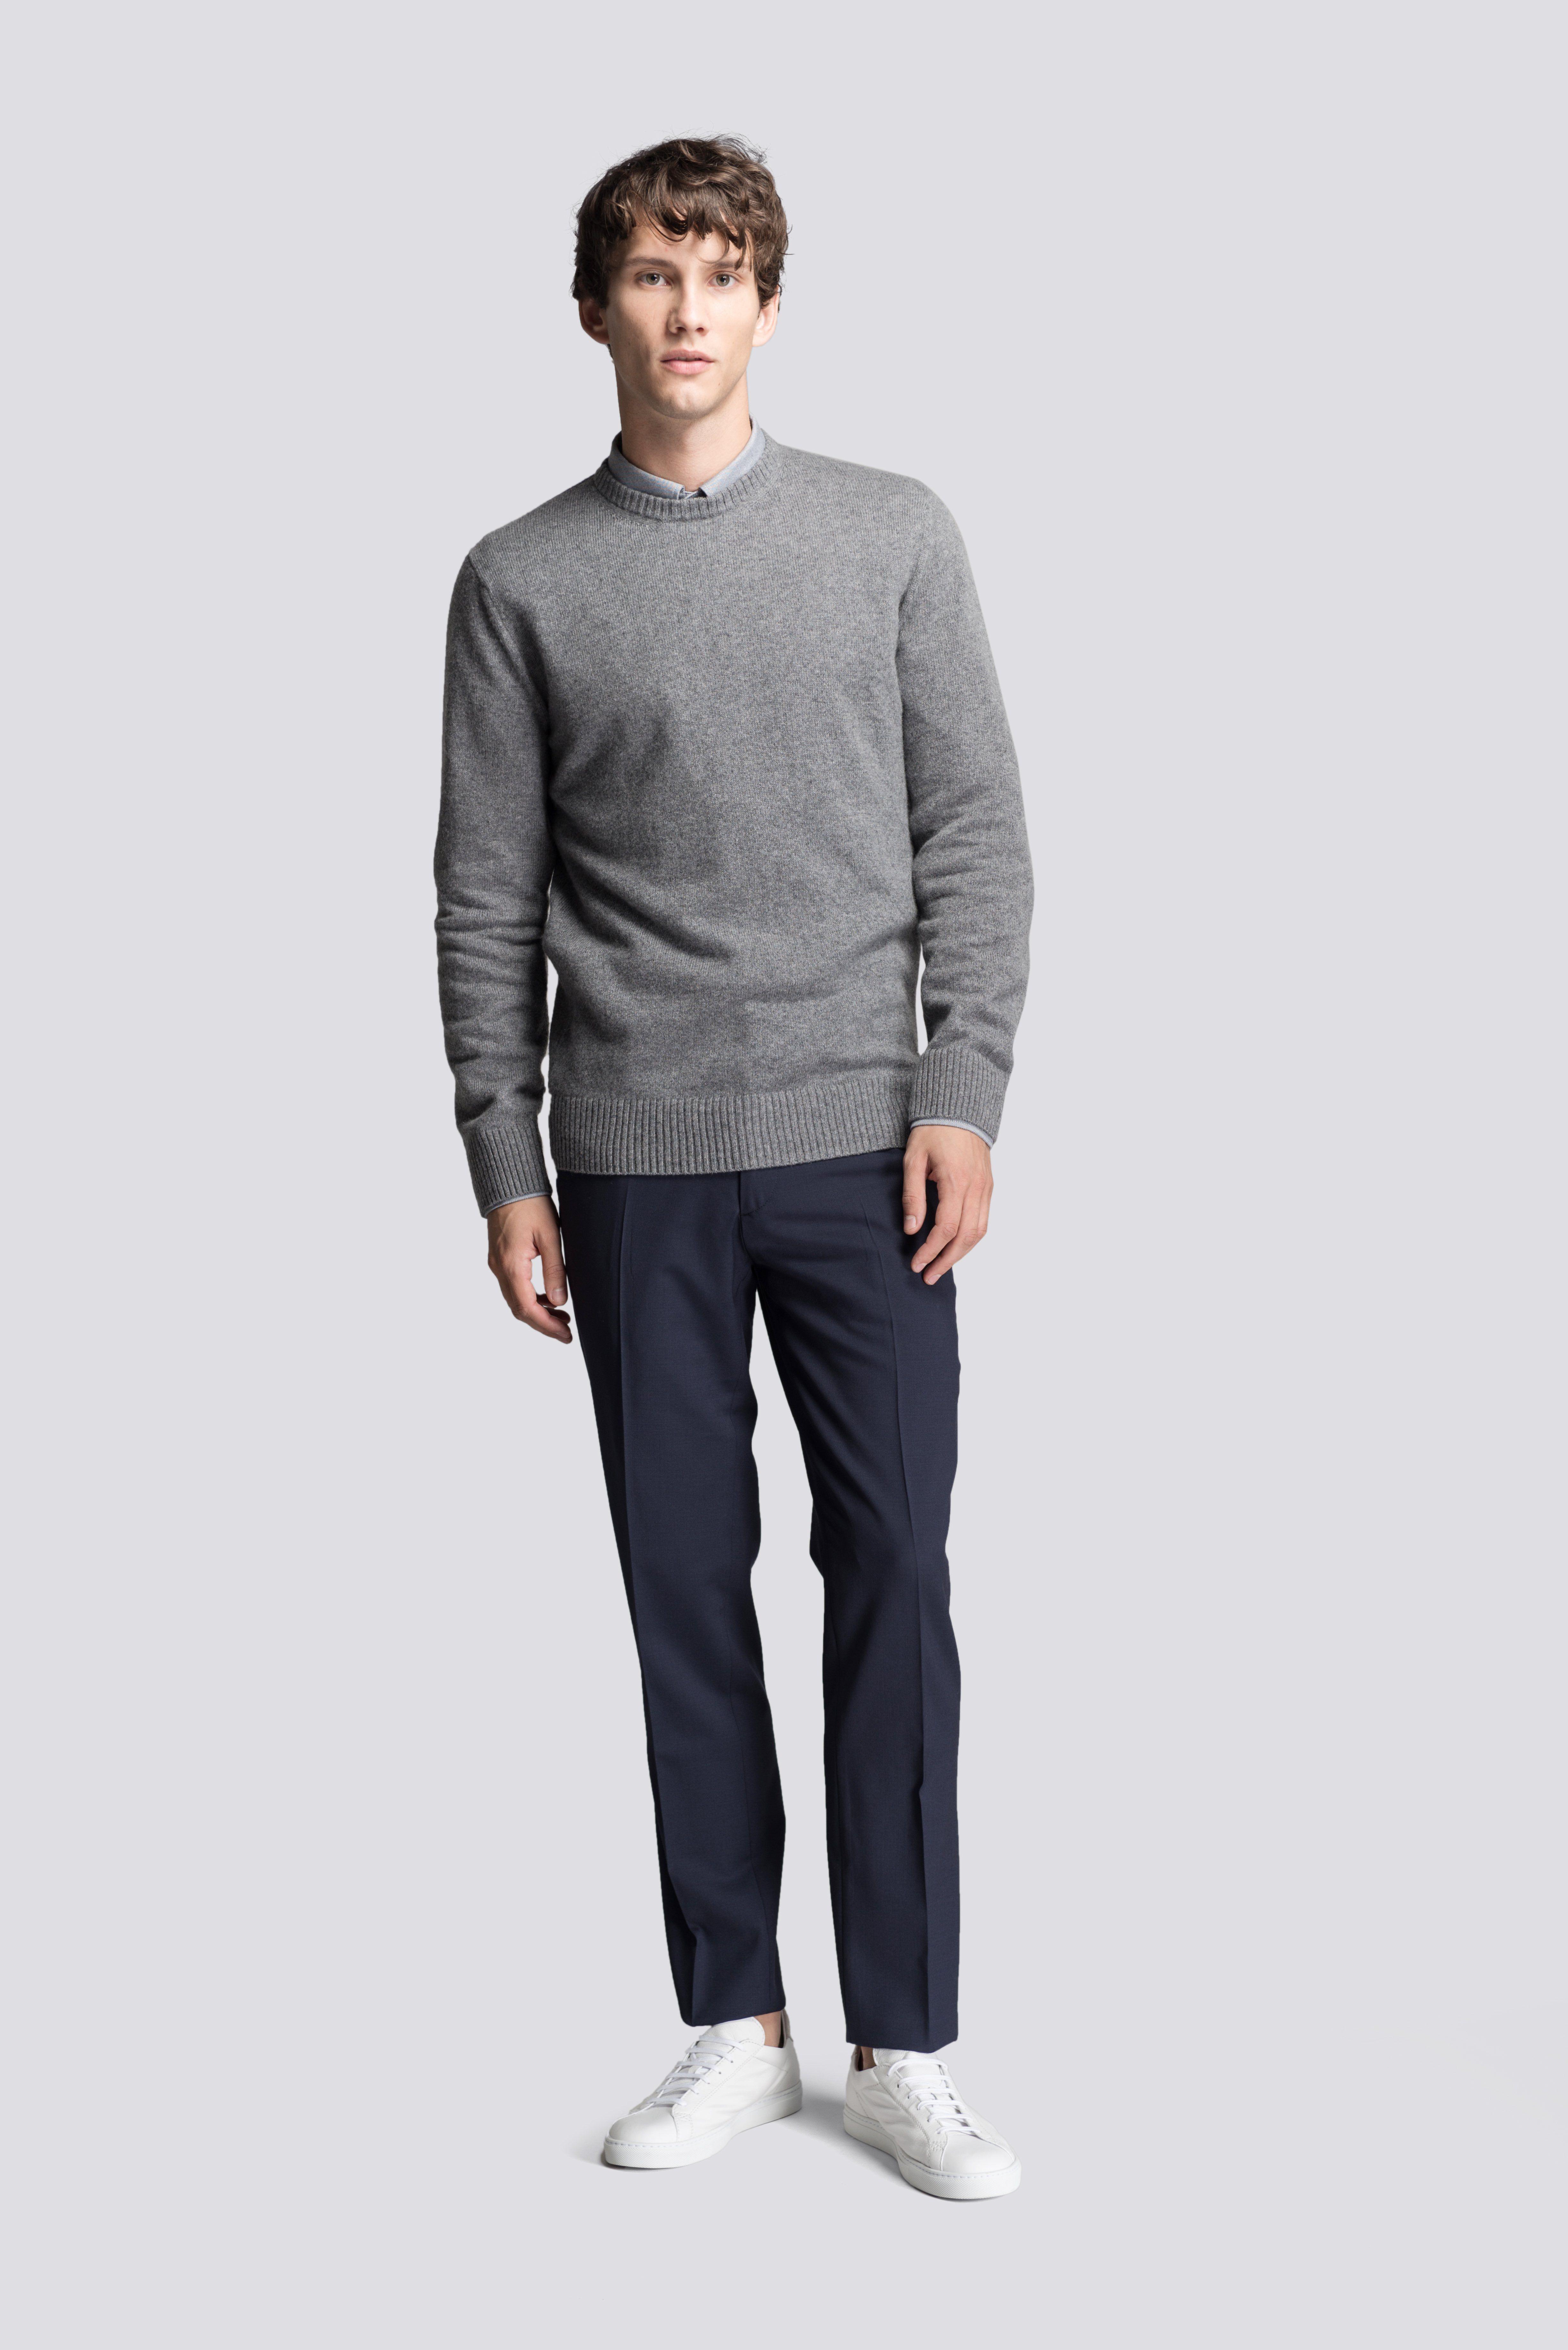 Dark Grey Cashmere sweater #asket | The ASKET Cashmere Sweater ...